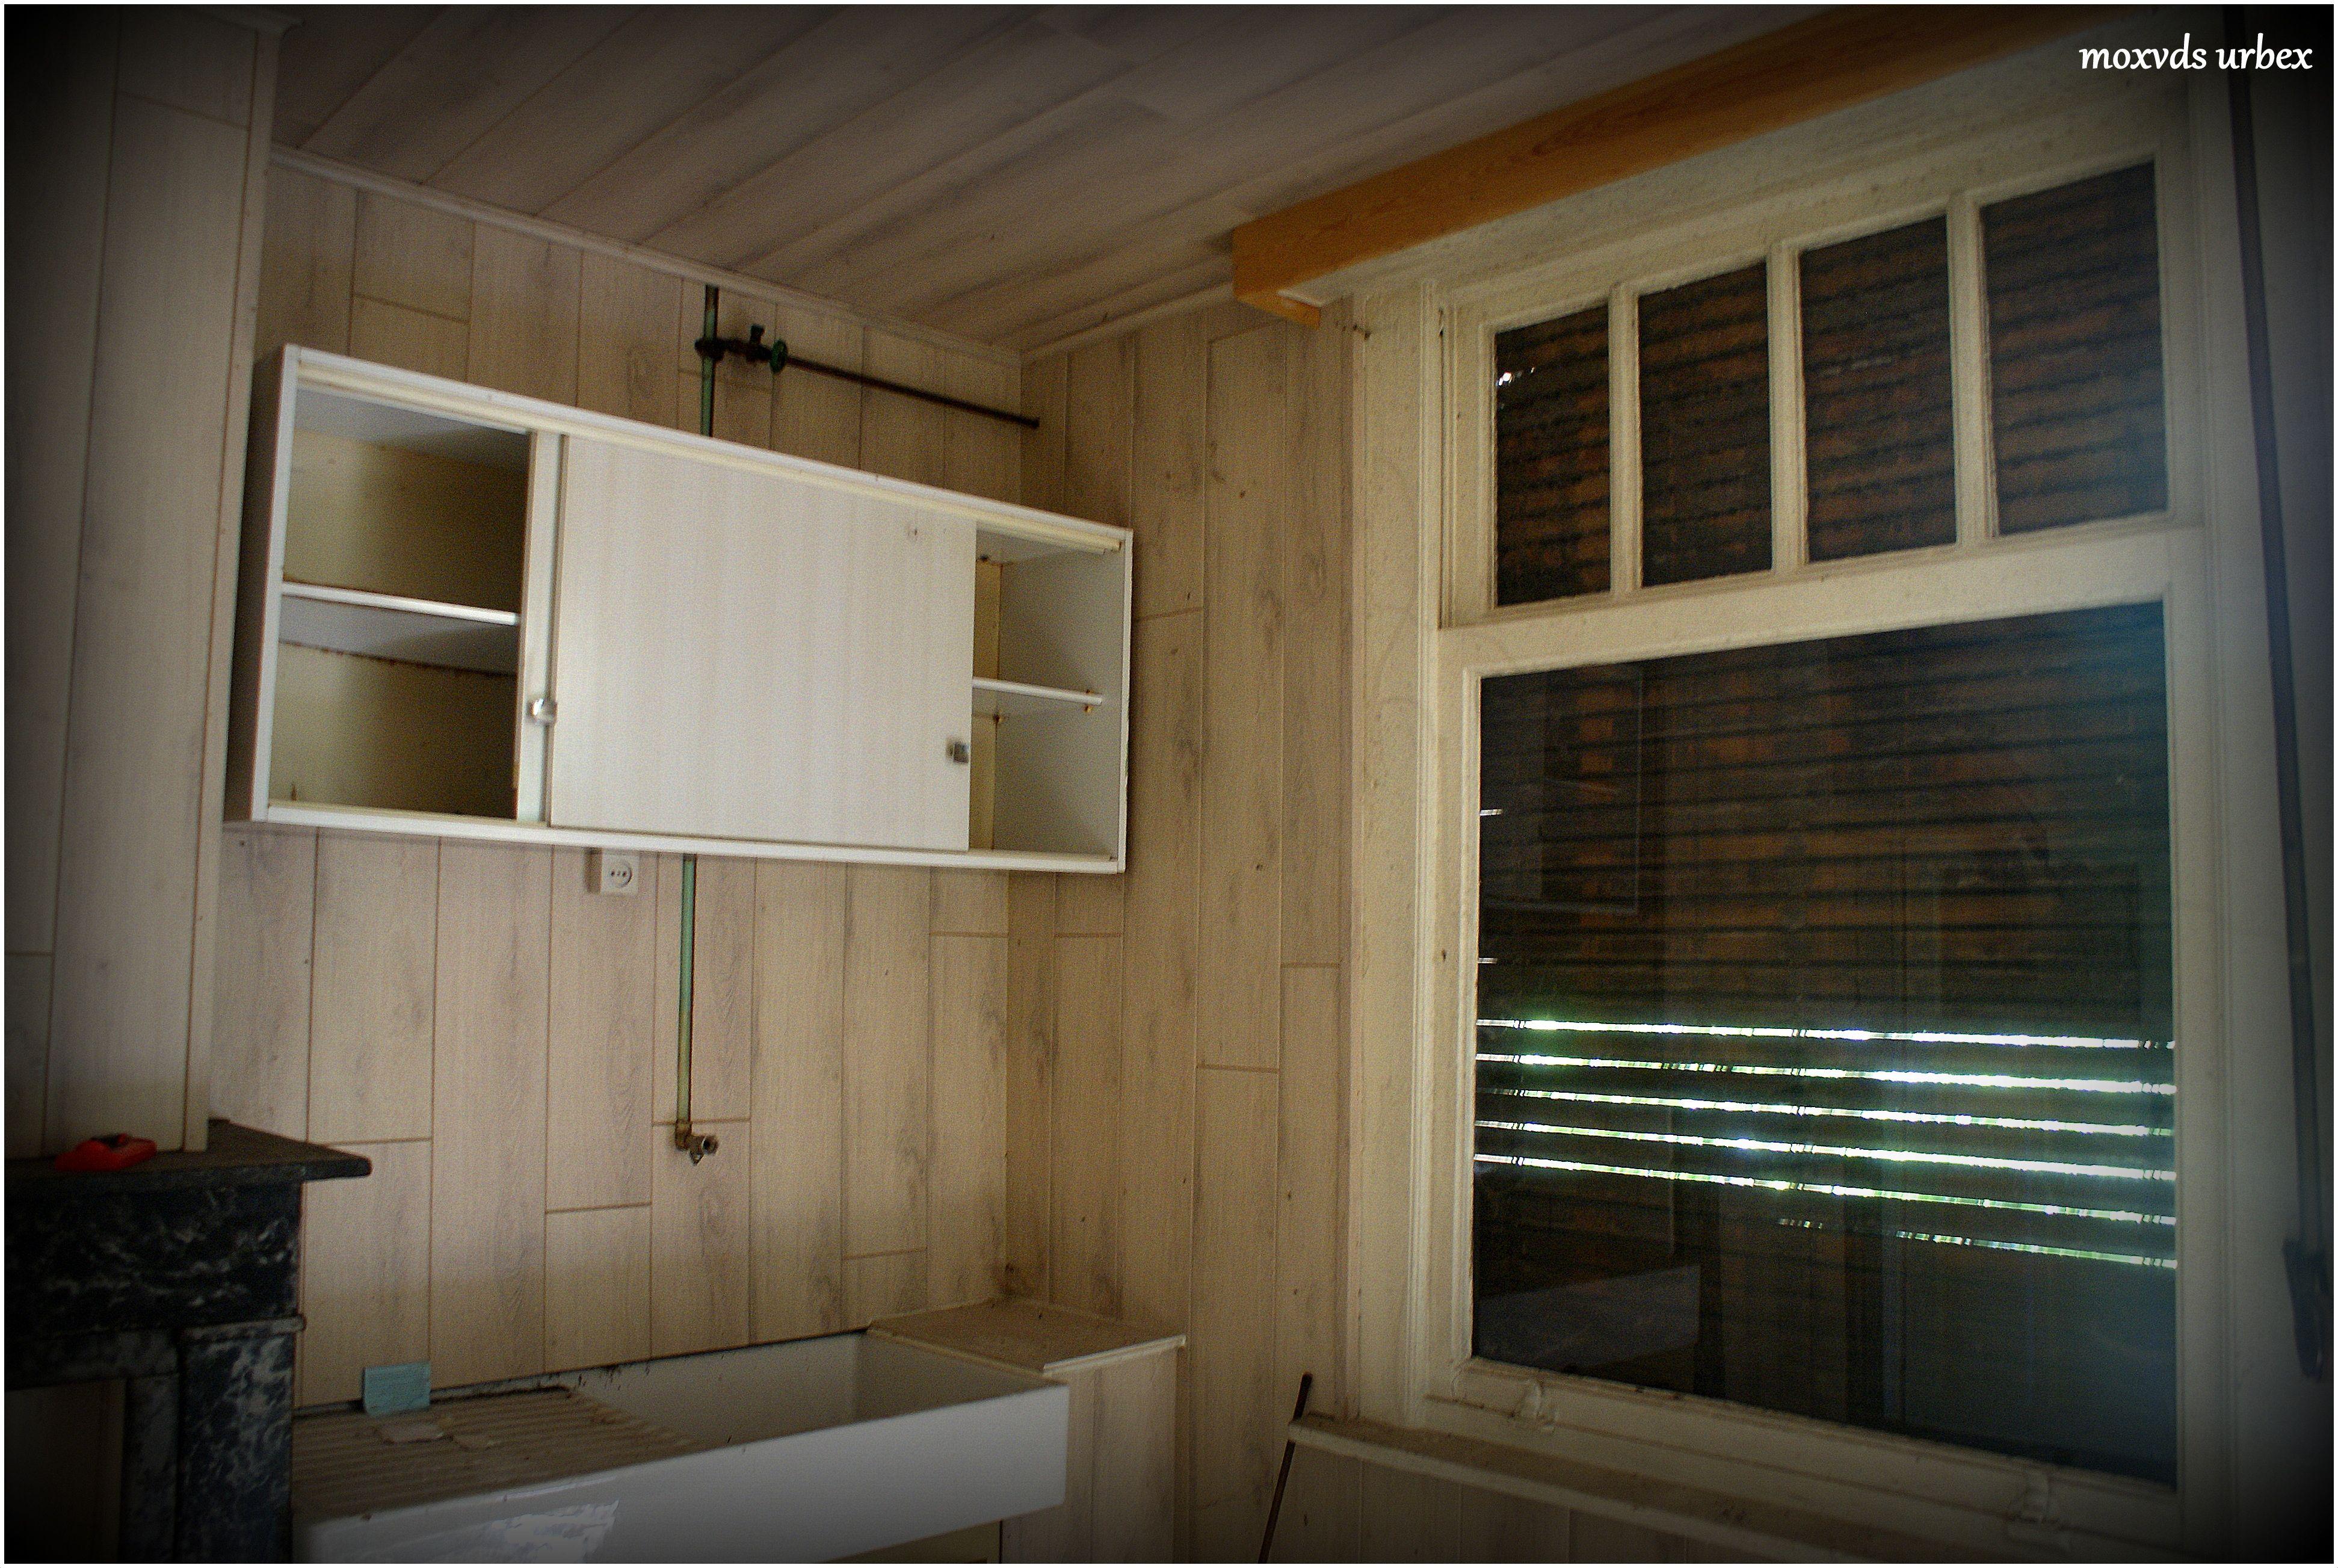 Window for kitchen  urbex abandoned window kitchen cafe  x urbex u exploring x